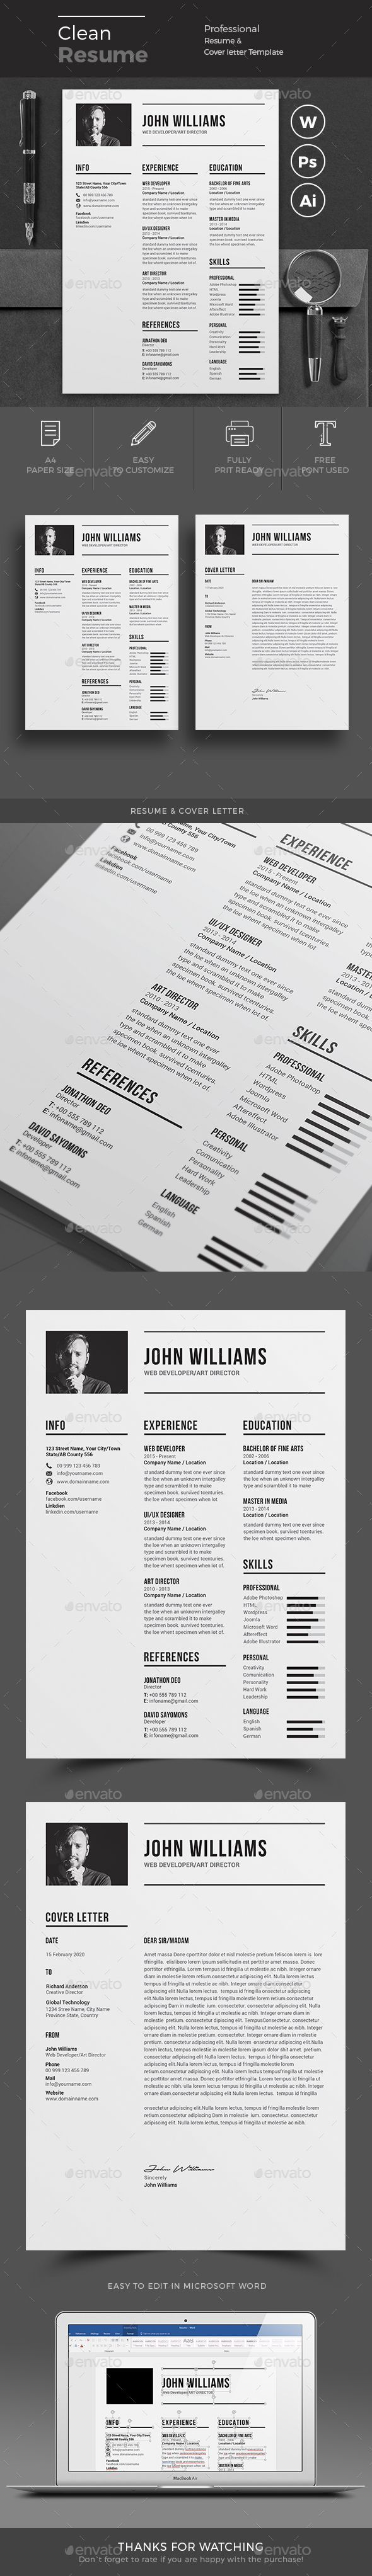 resume template - resume builder - cv template